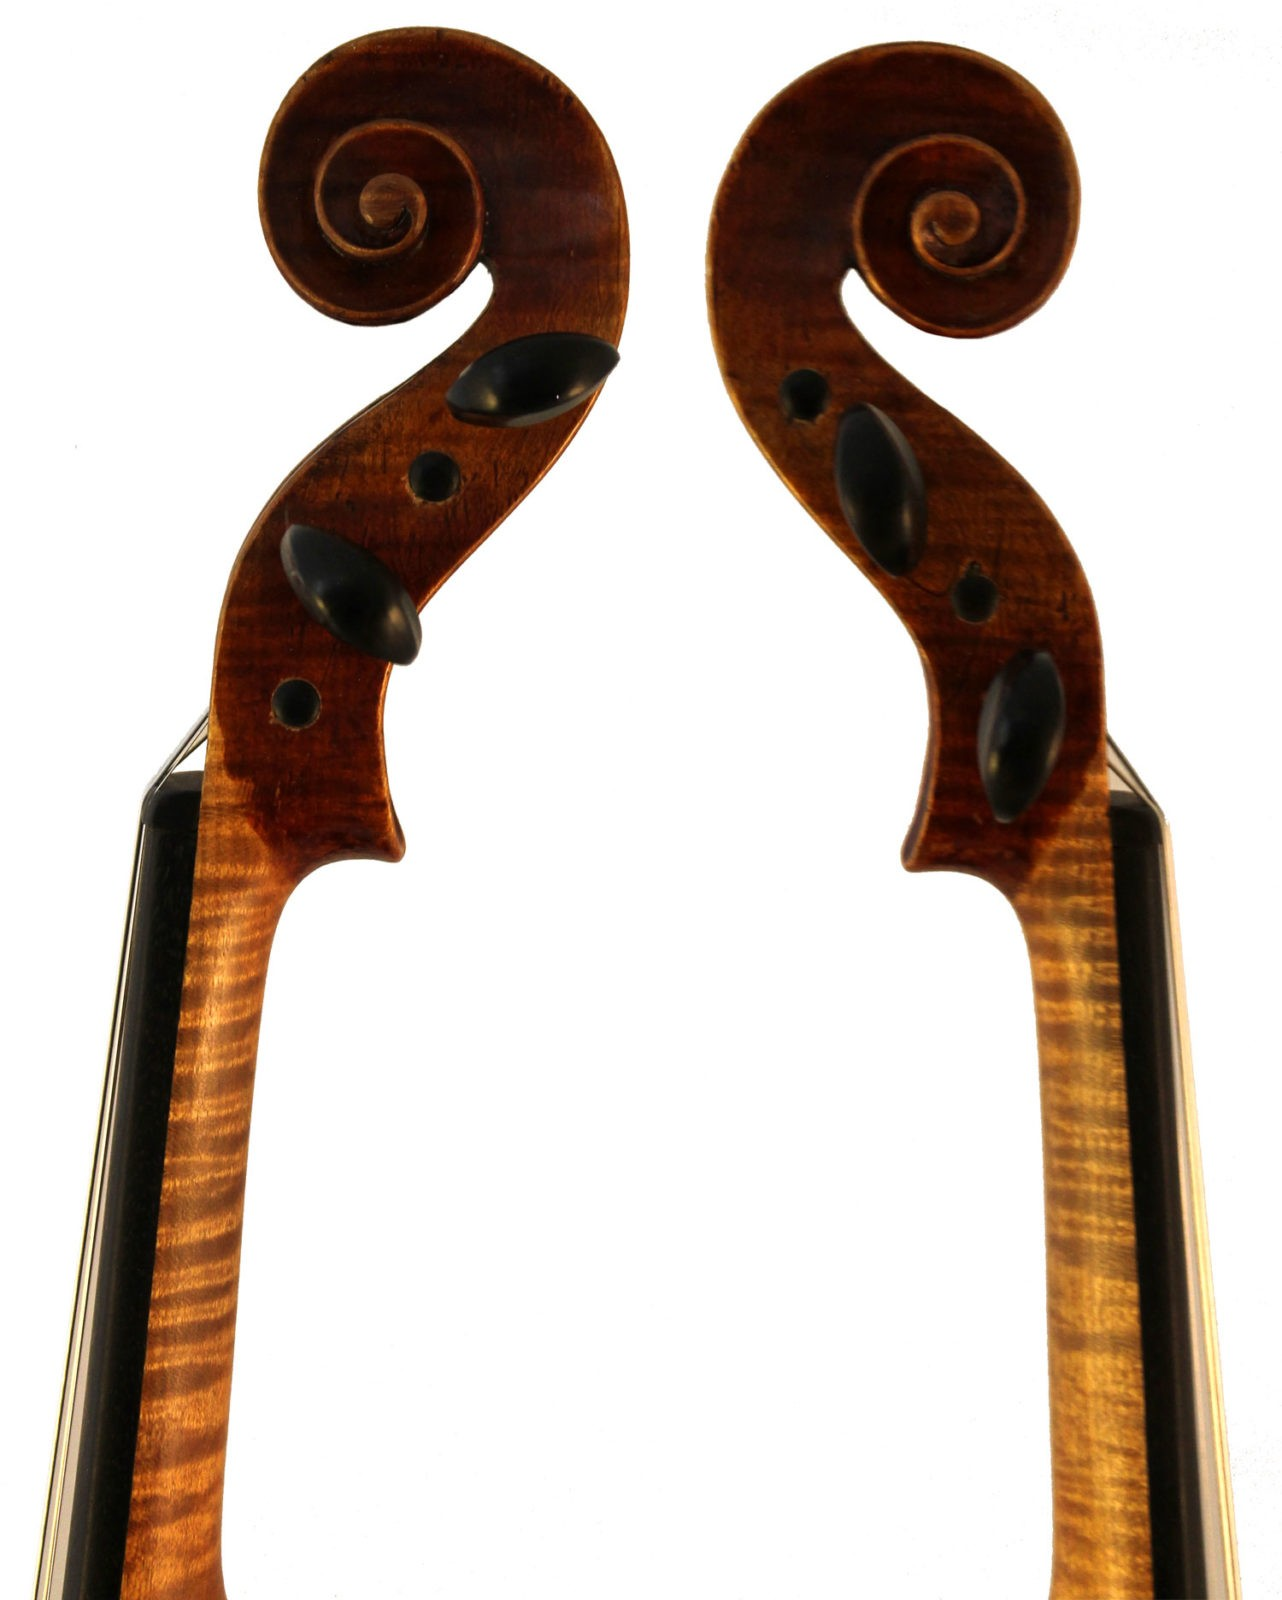 Albin O Schmidt violin scroll sides